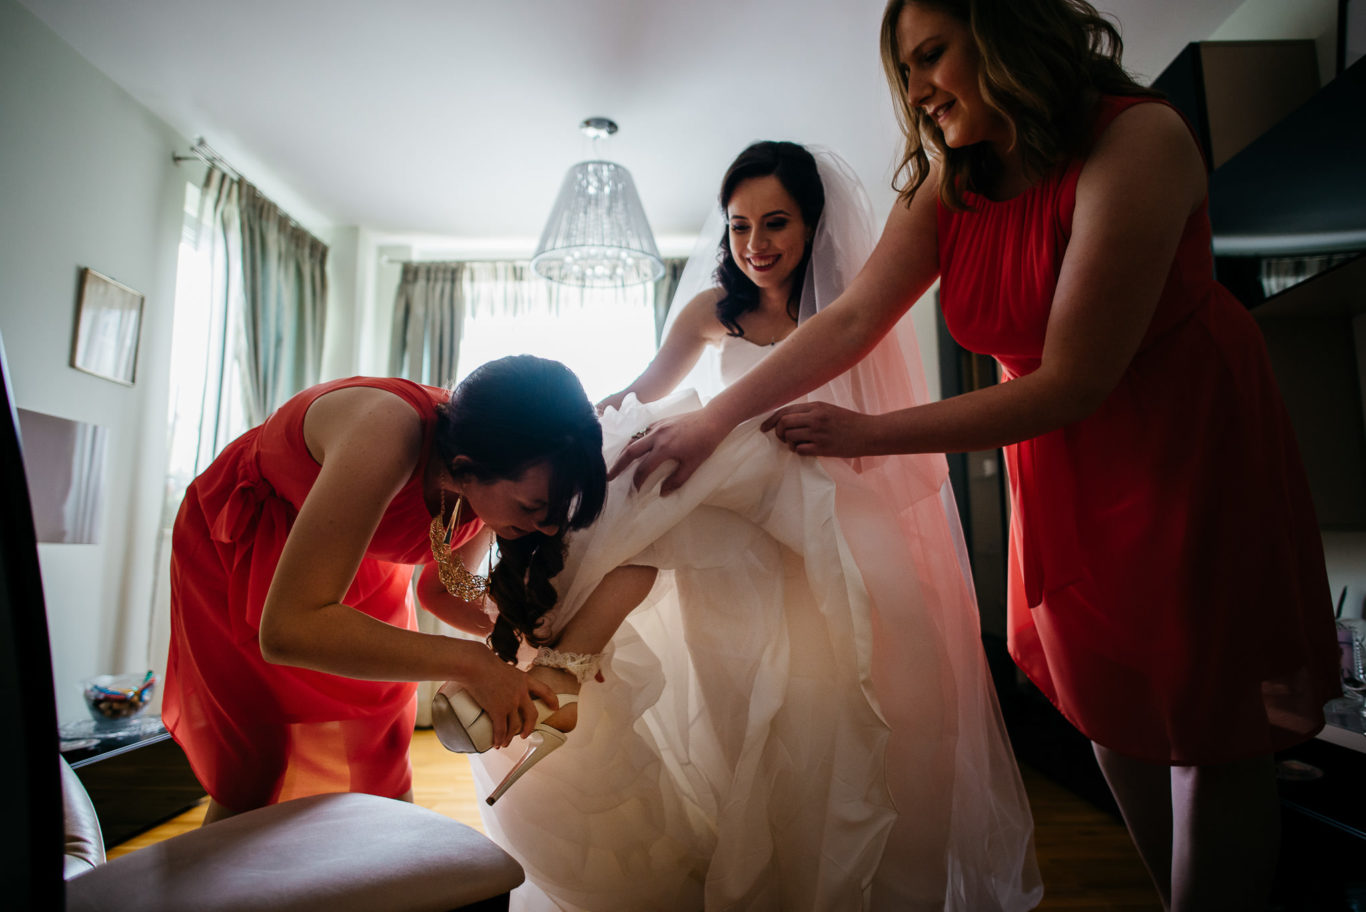 0227-Fotografie-nunta-Simona-Valentin-fotograf-Ciprian-Dumitrescu-DSC_1036